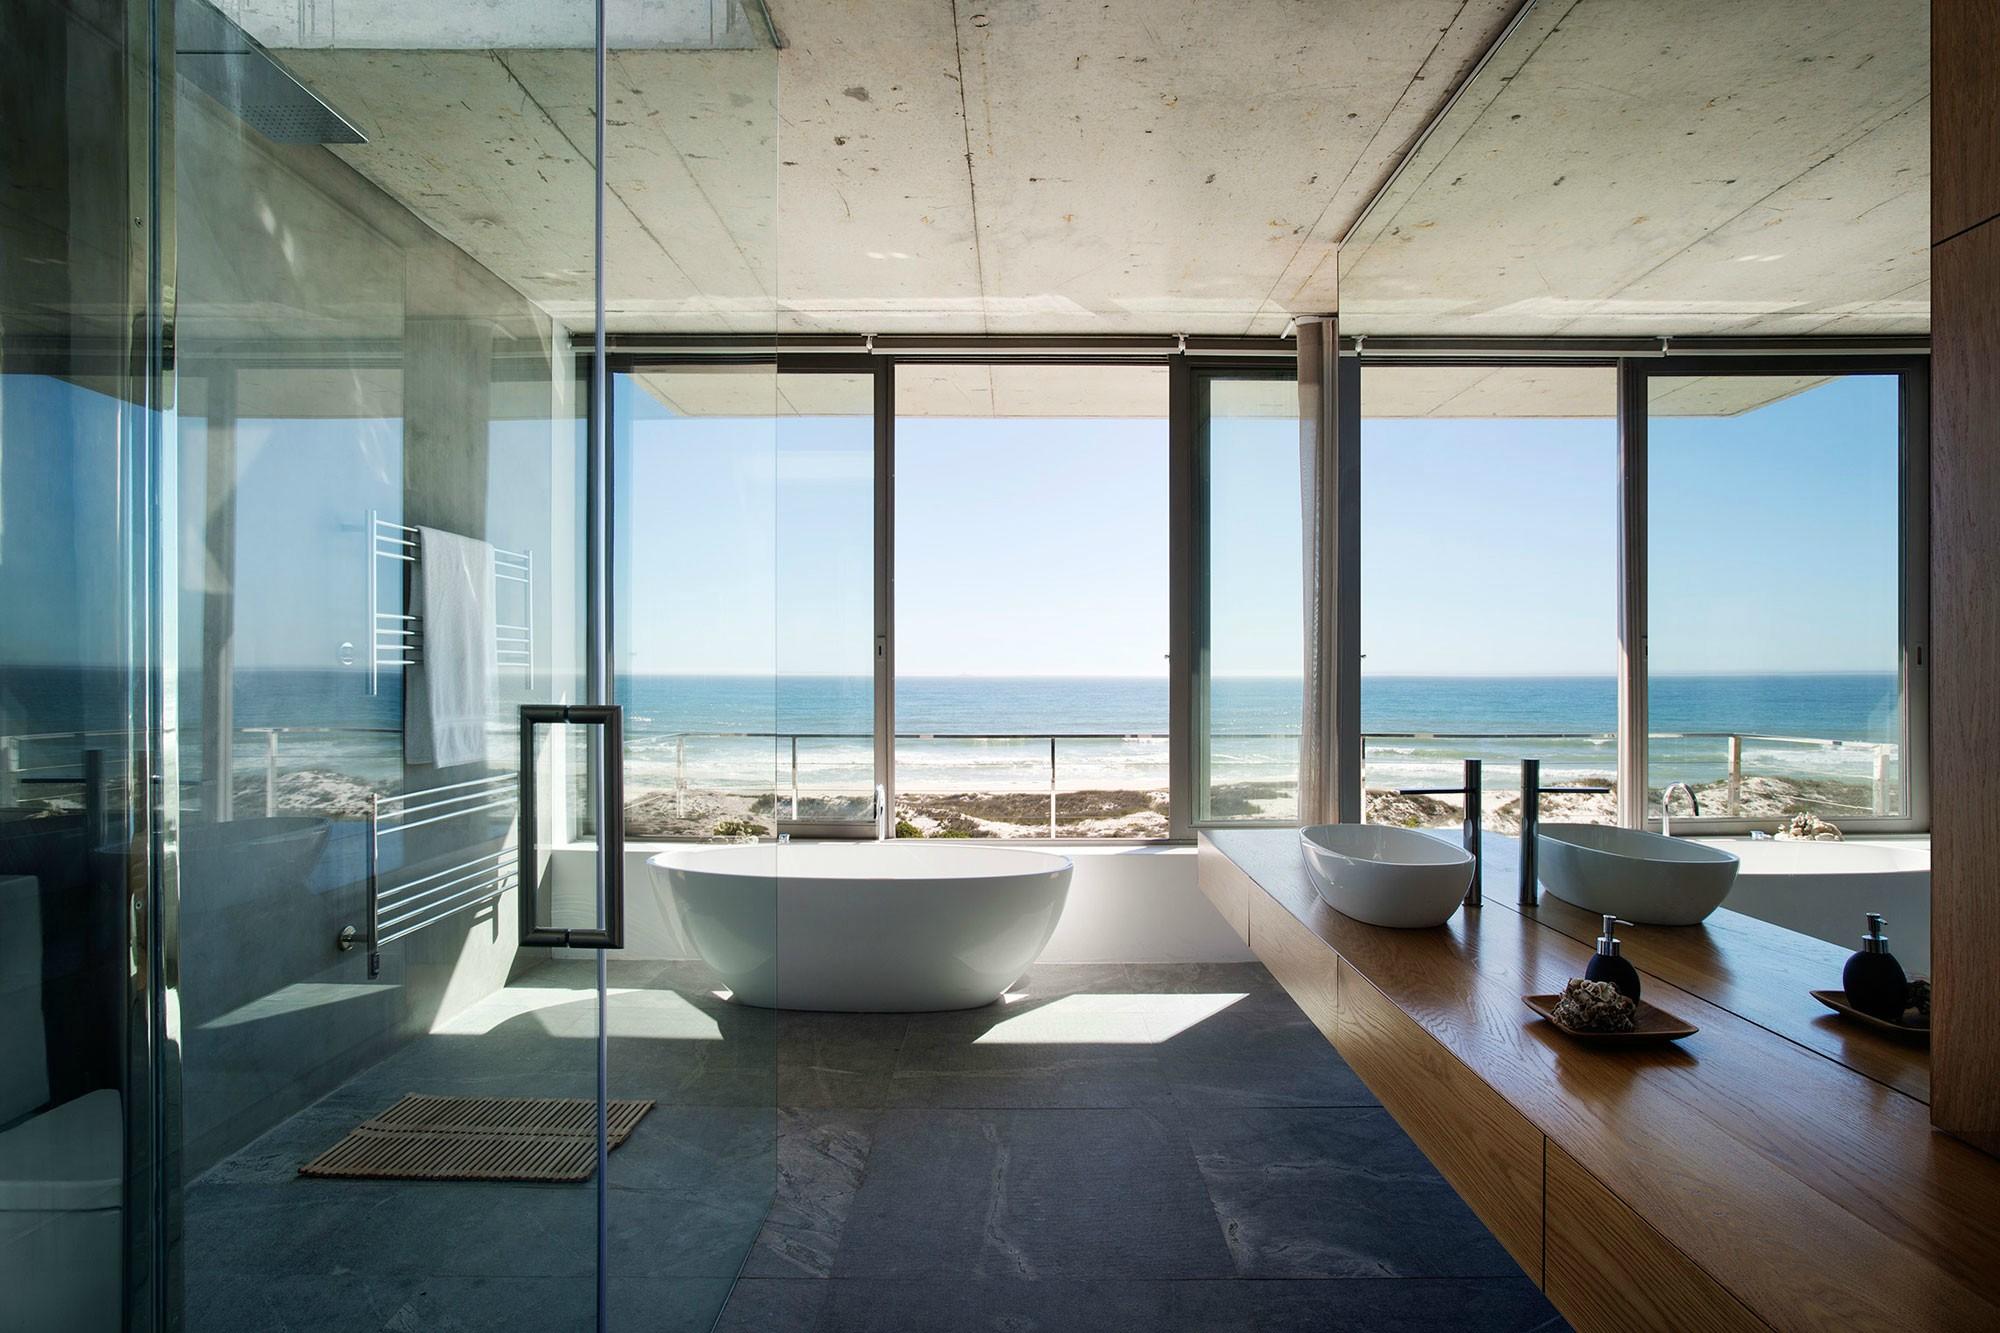 Modernize Your Bathroom With a New Set of Innovative Designs